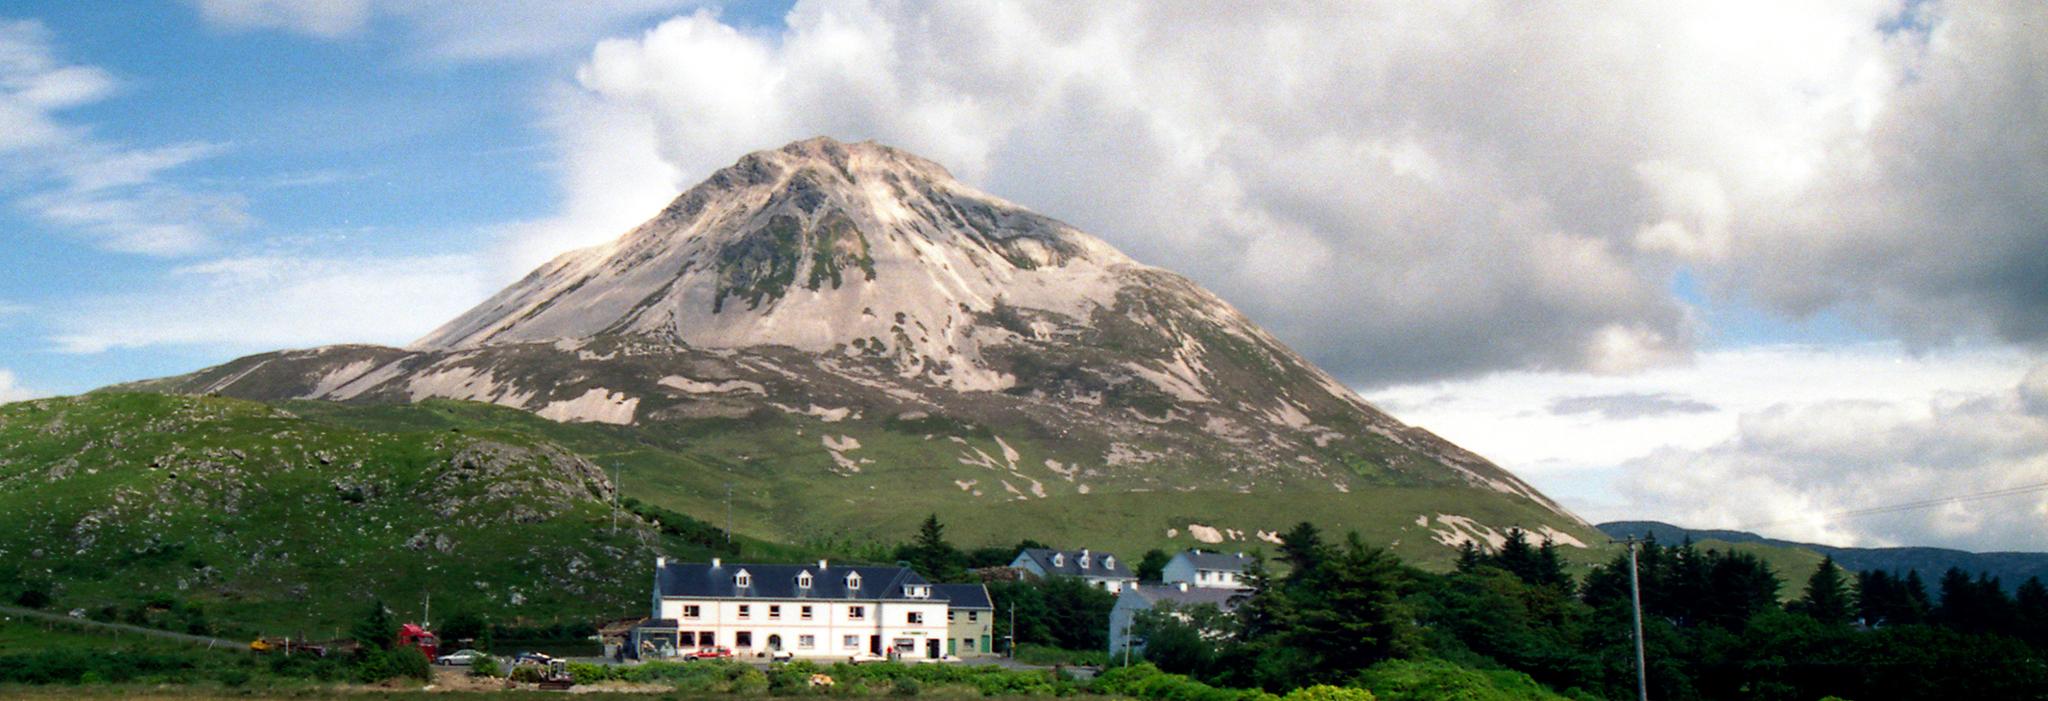 Mt. Errigal in Dunlewey, County Donegal, Ireland.